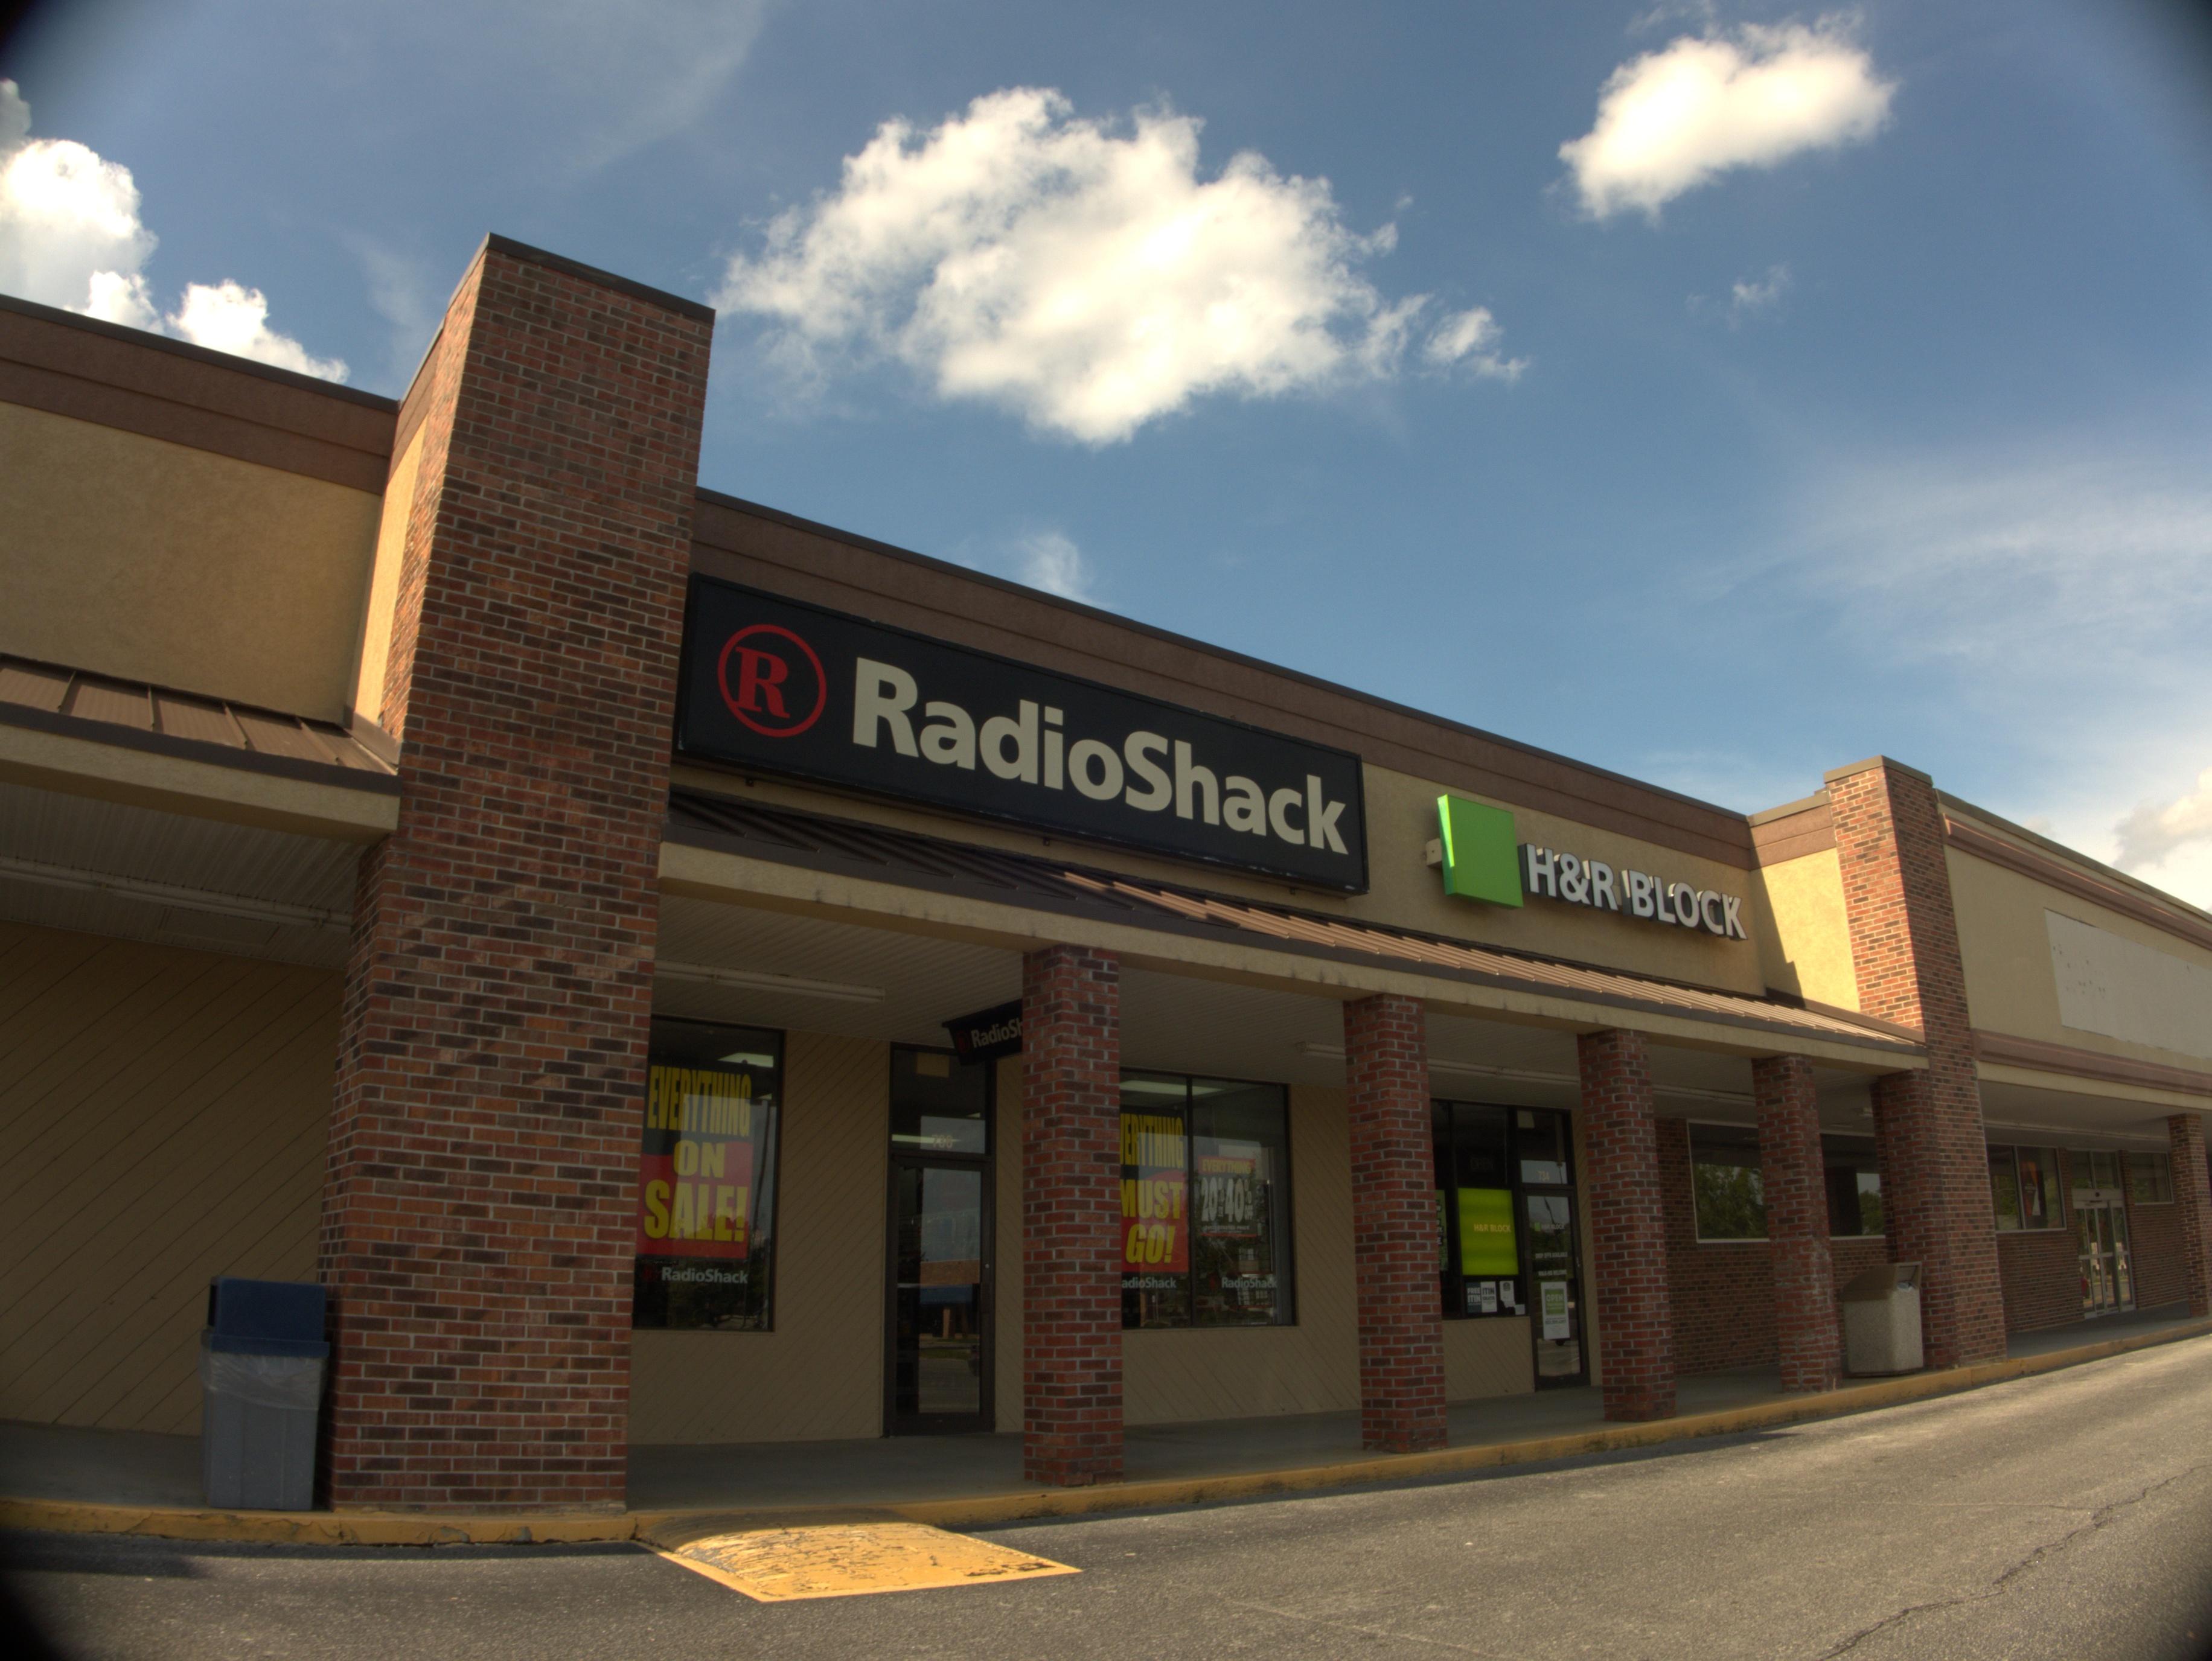 Radio Shack, 736 West Main Street Lexington: Late Summer 2016 at